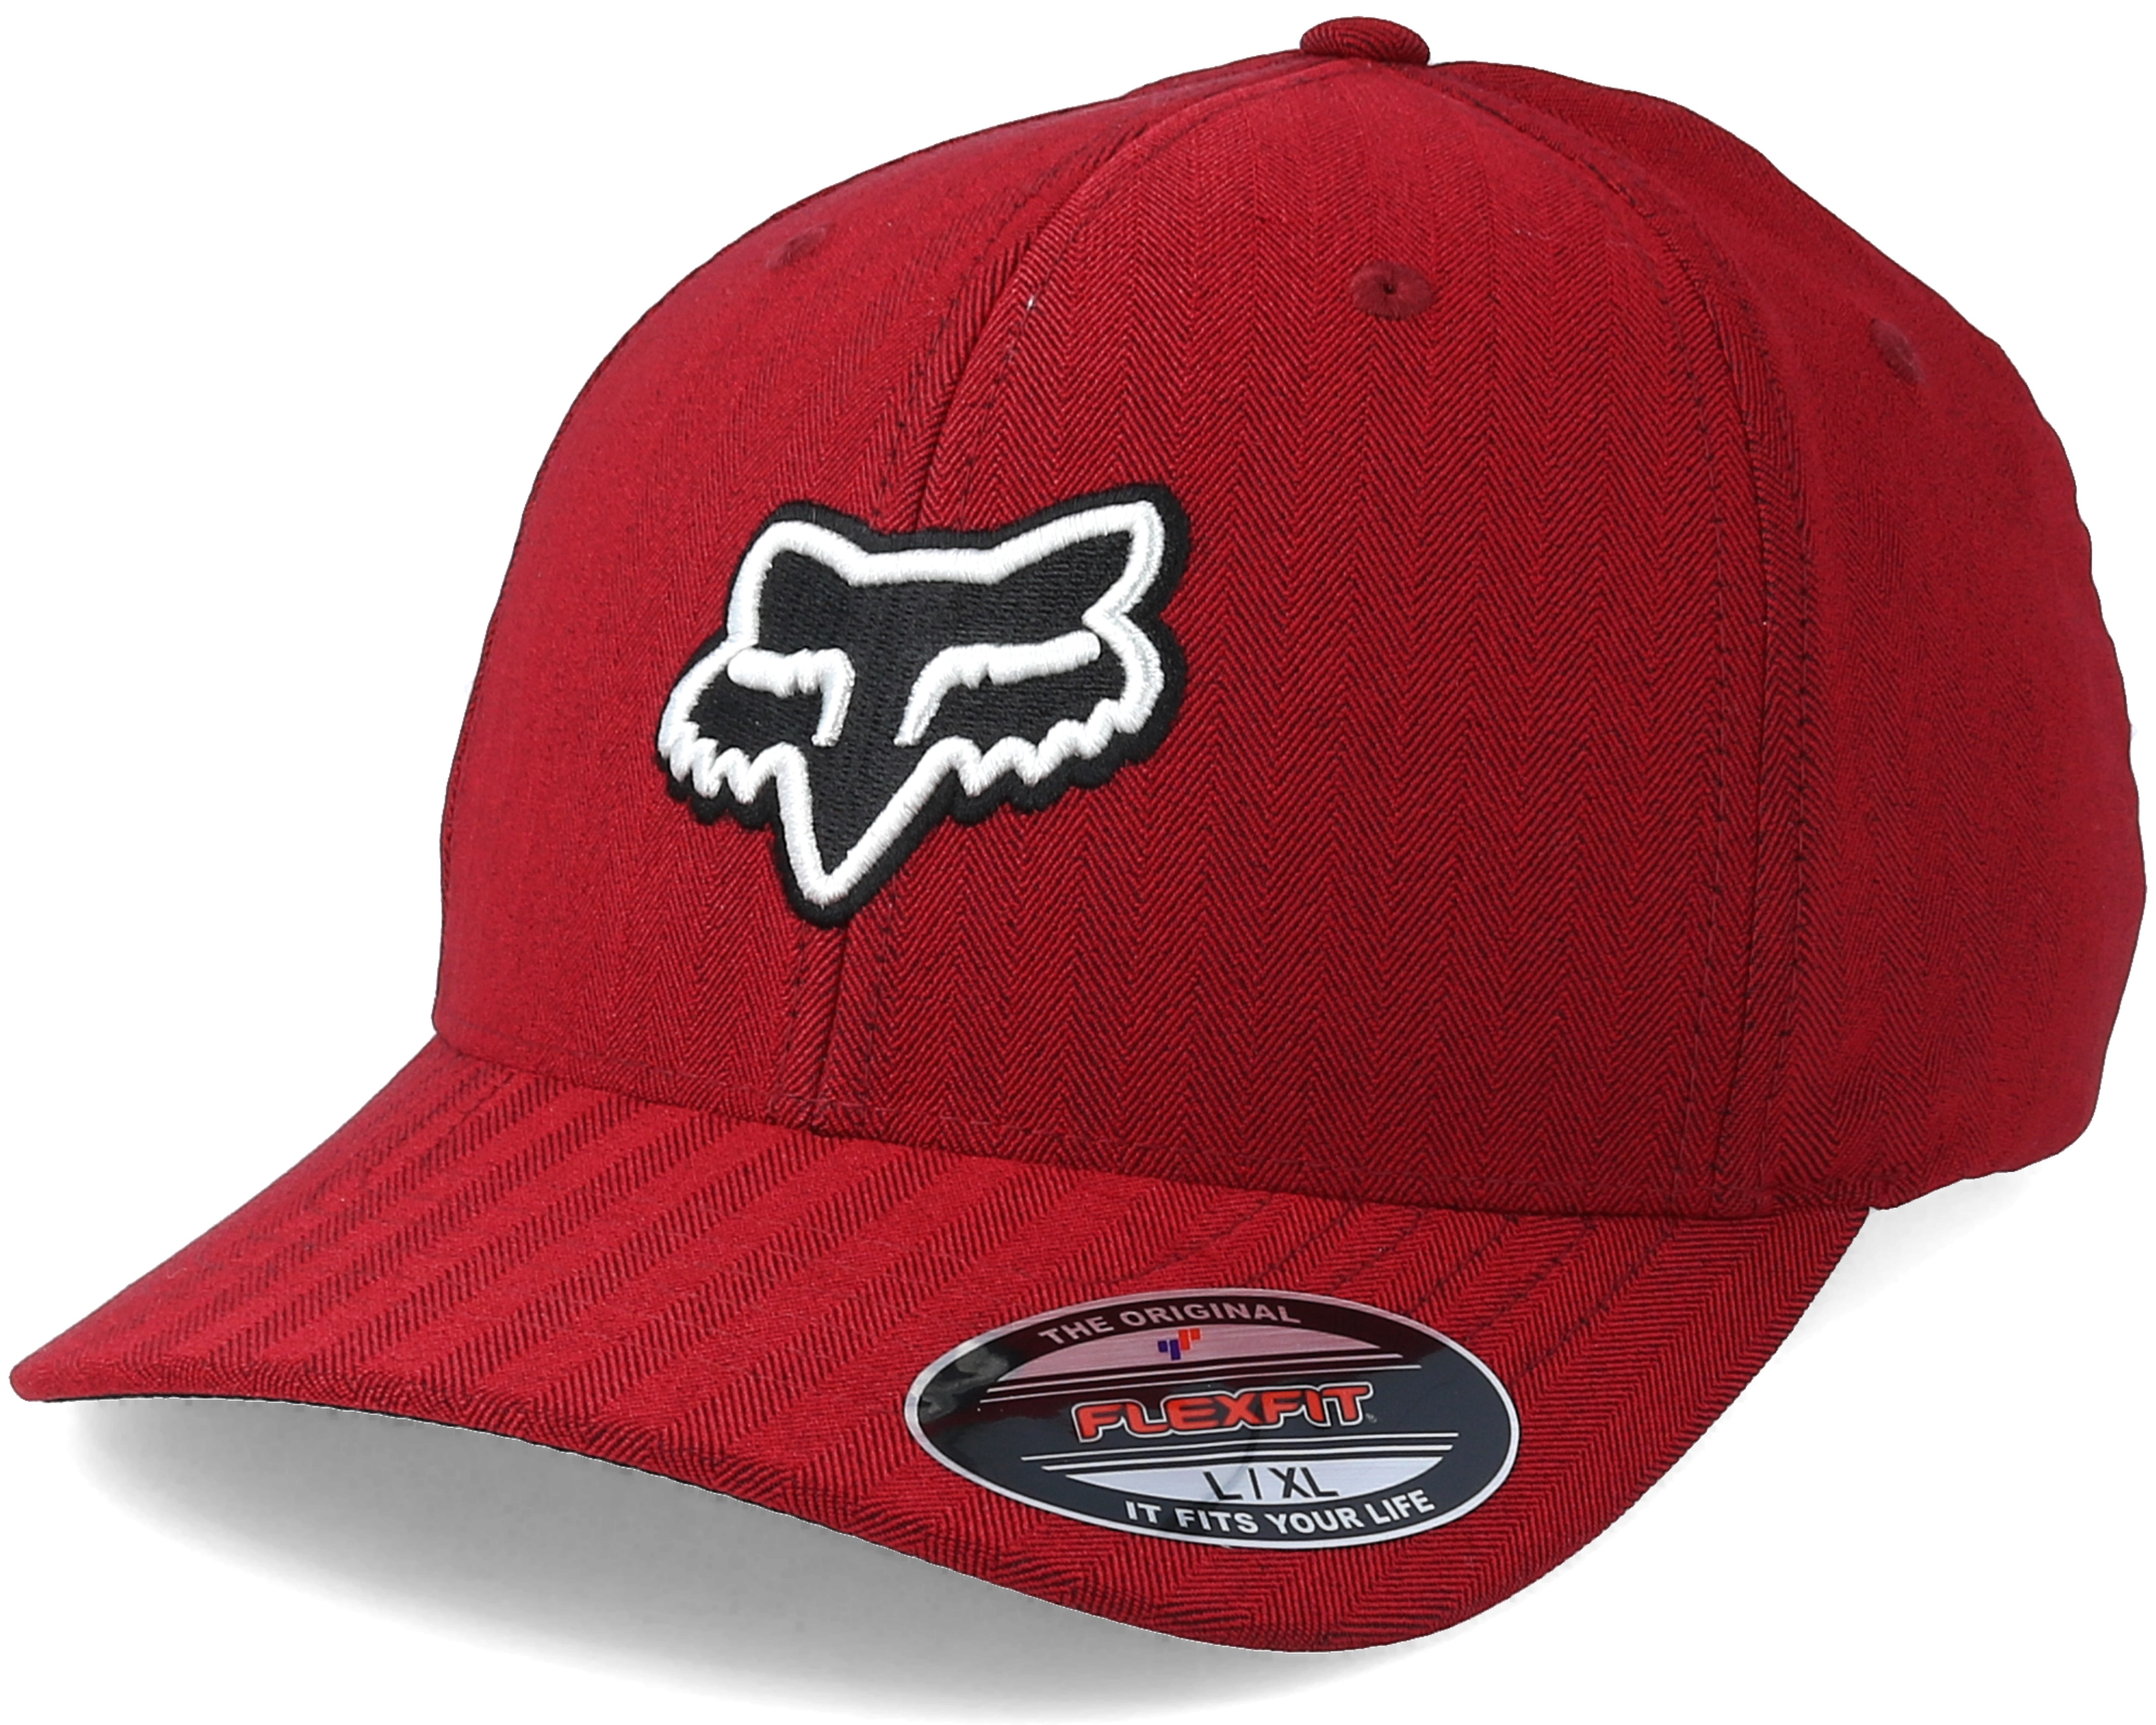 Transfer Red Flexfit - Fox lippis - Hatstore.fi 8c62f92d93